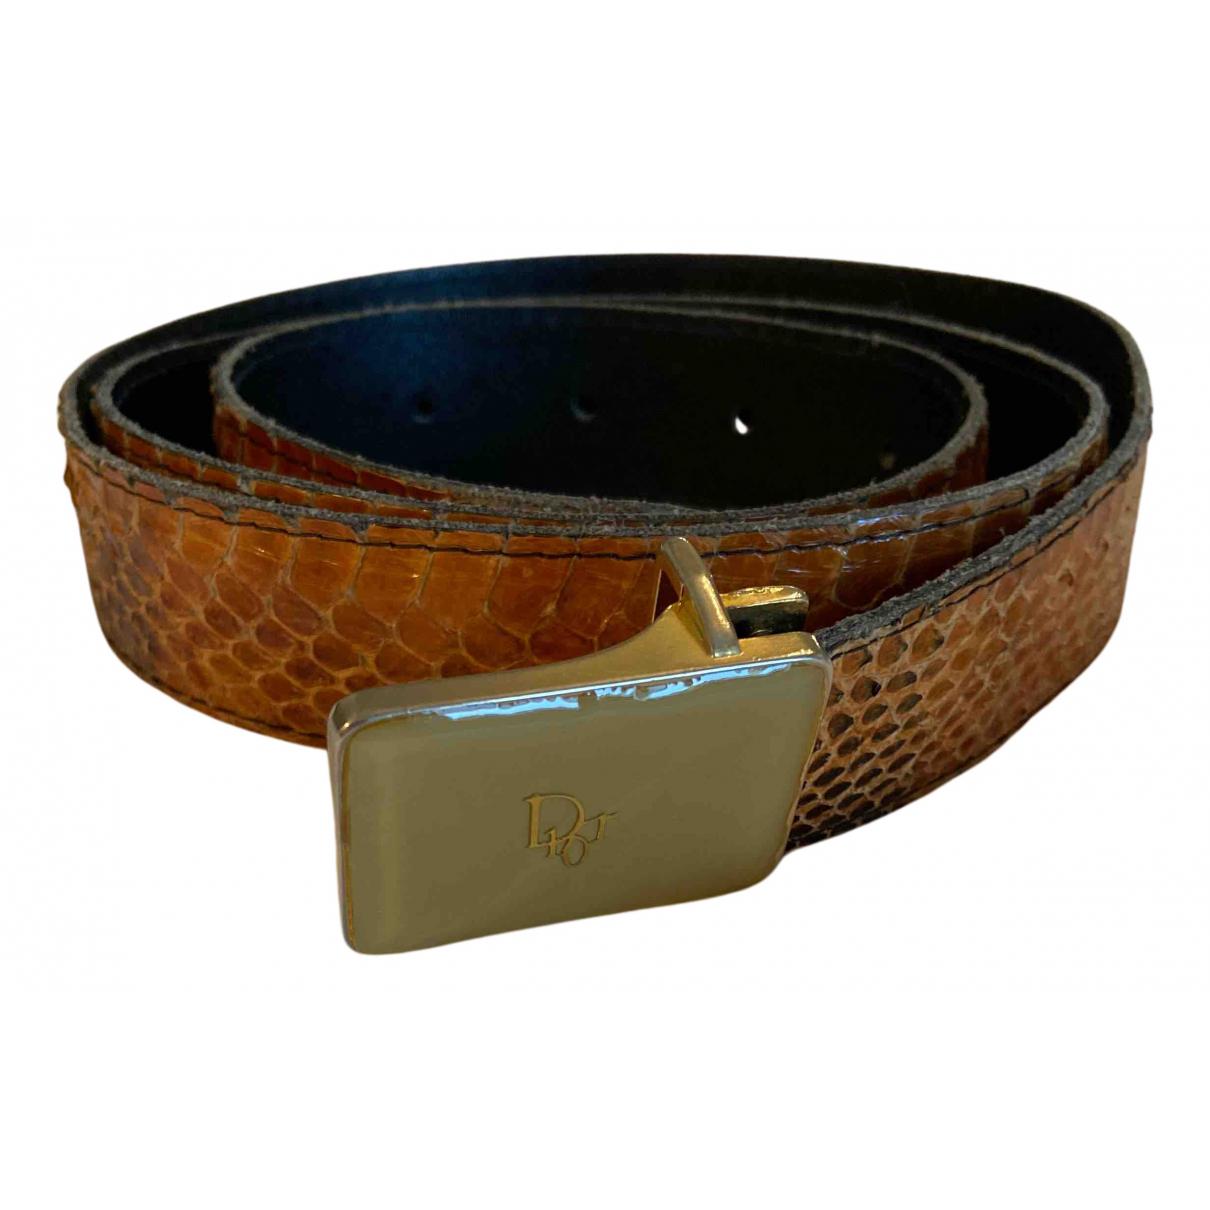 Cinturon de Piton Dior